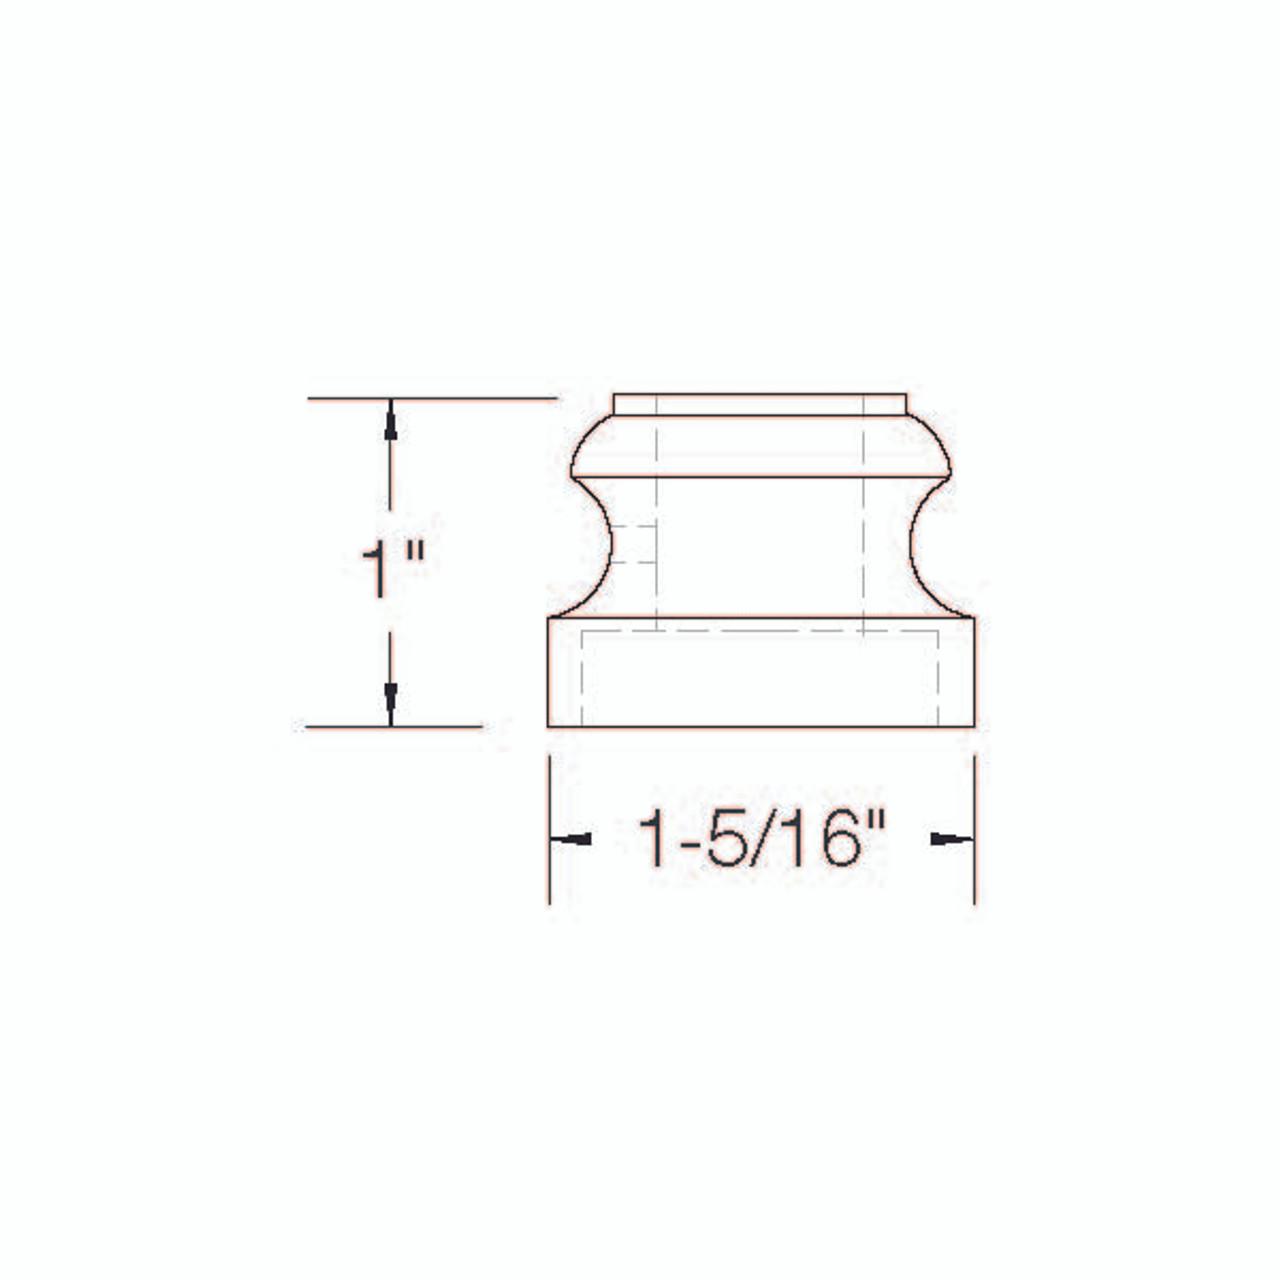 SH901 Flat Shoe Dimensional Information